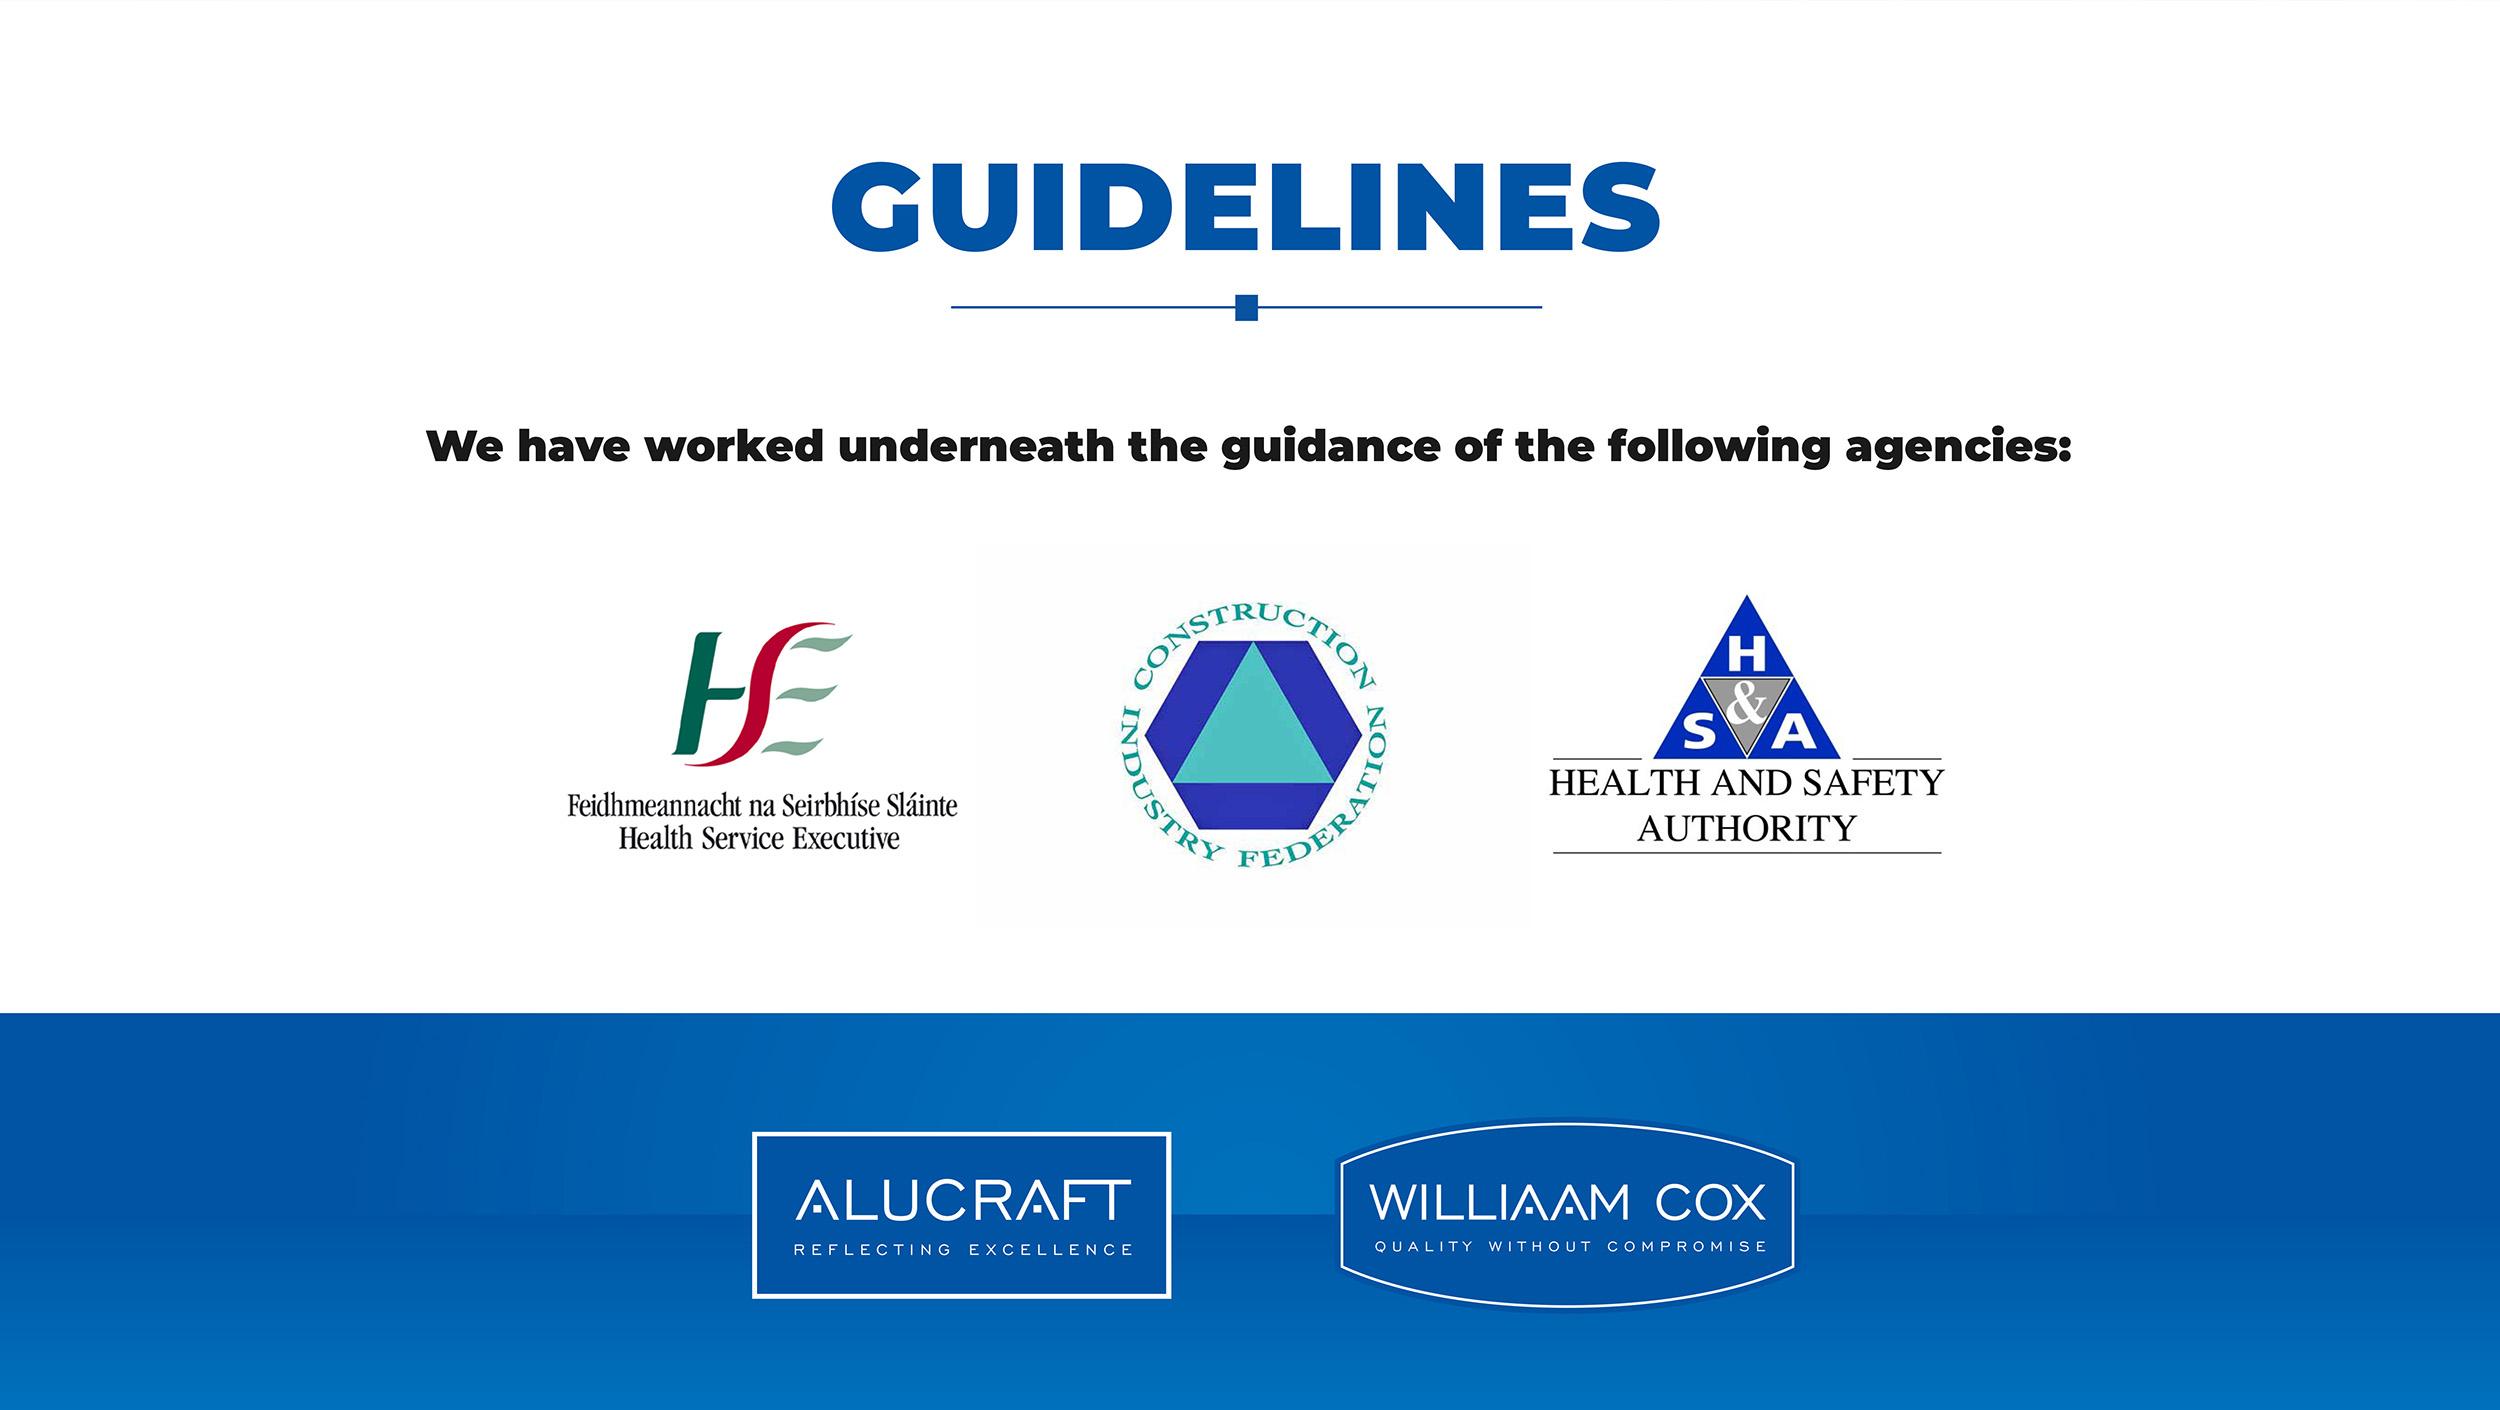 Regulatory body guidelines graphic